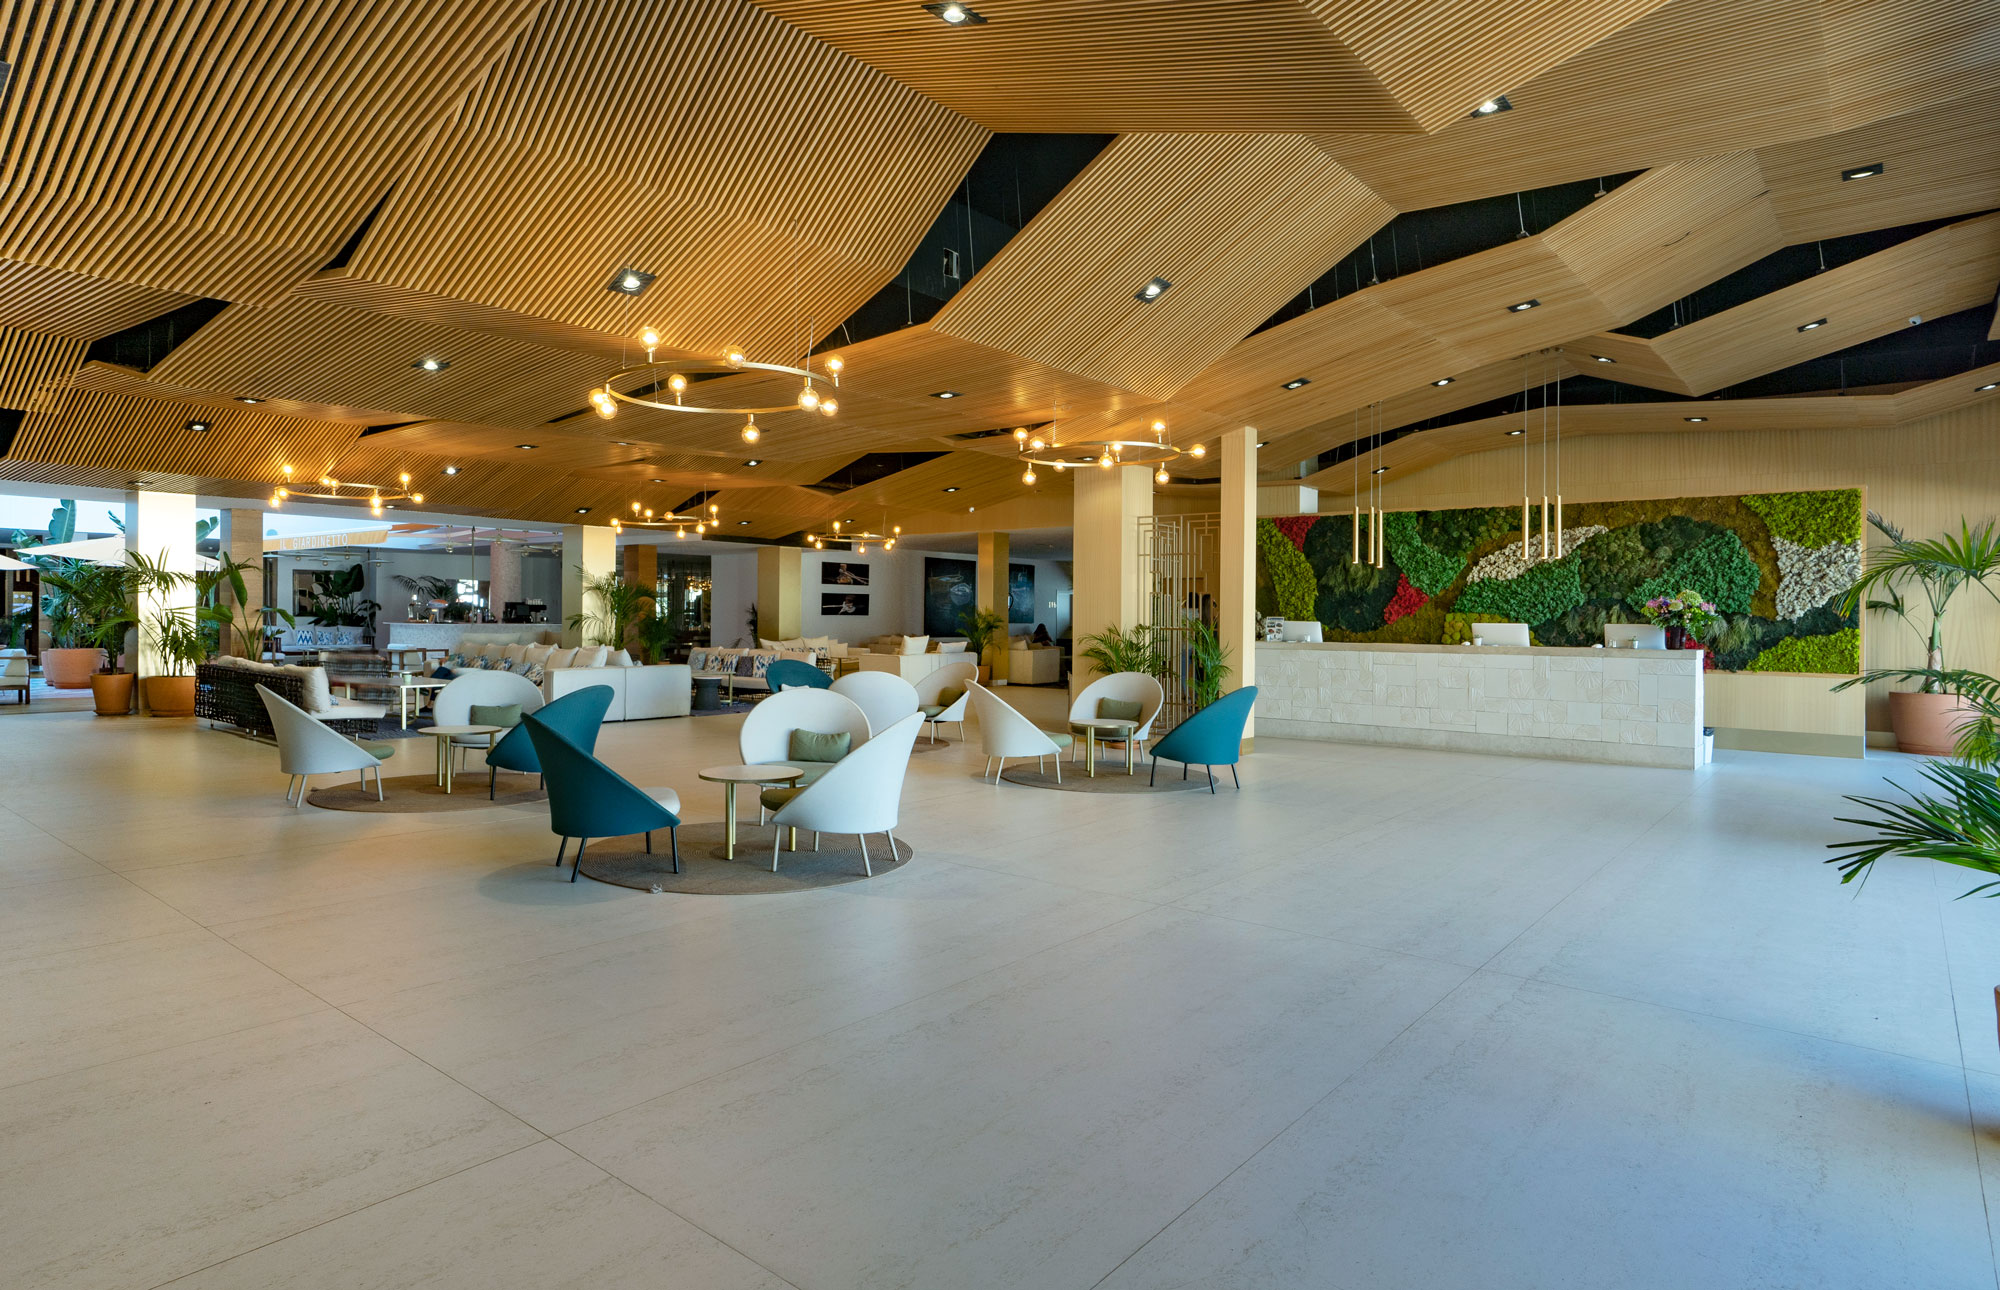 Hotel Mediterráneo  - Hotel Mediterraneo Park 1 Dekton Silestone Piedra Natural Cosentino 49